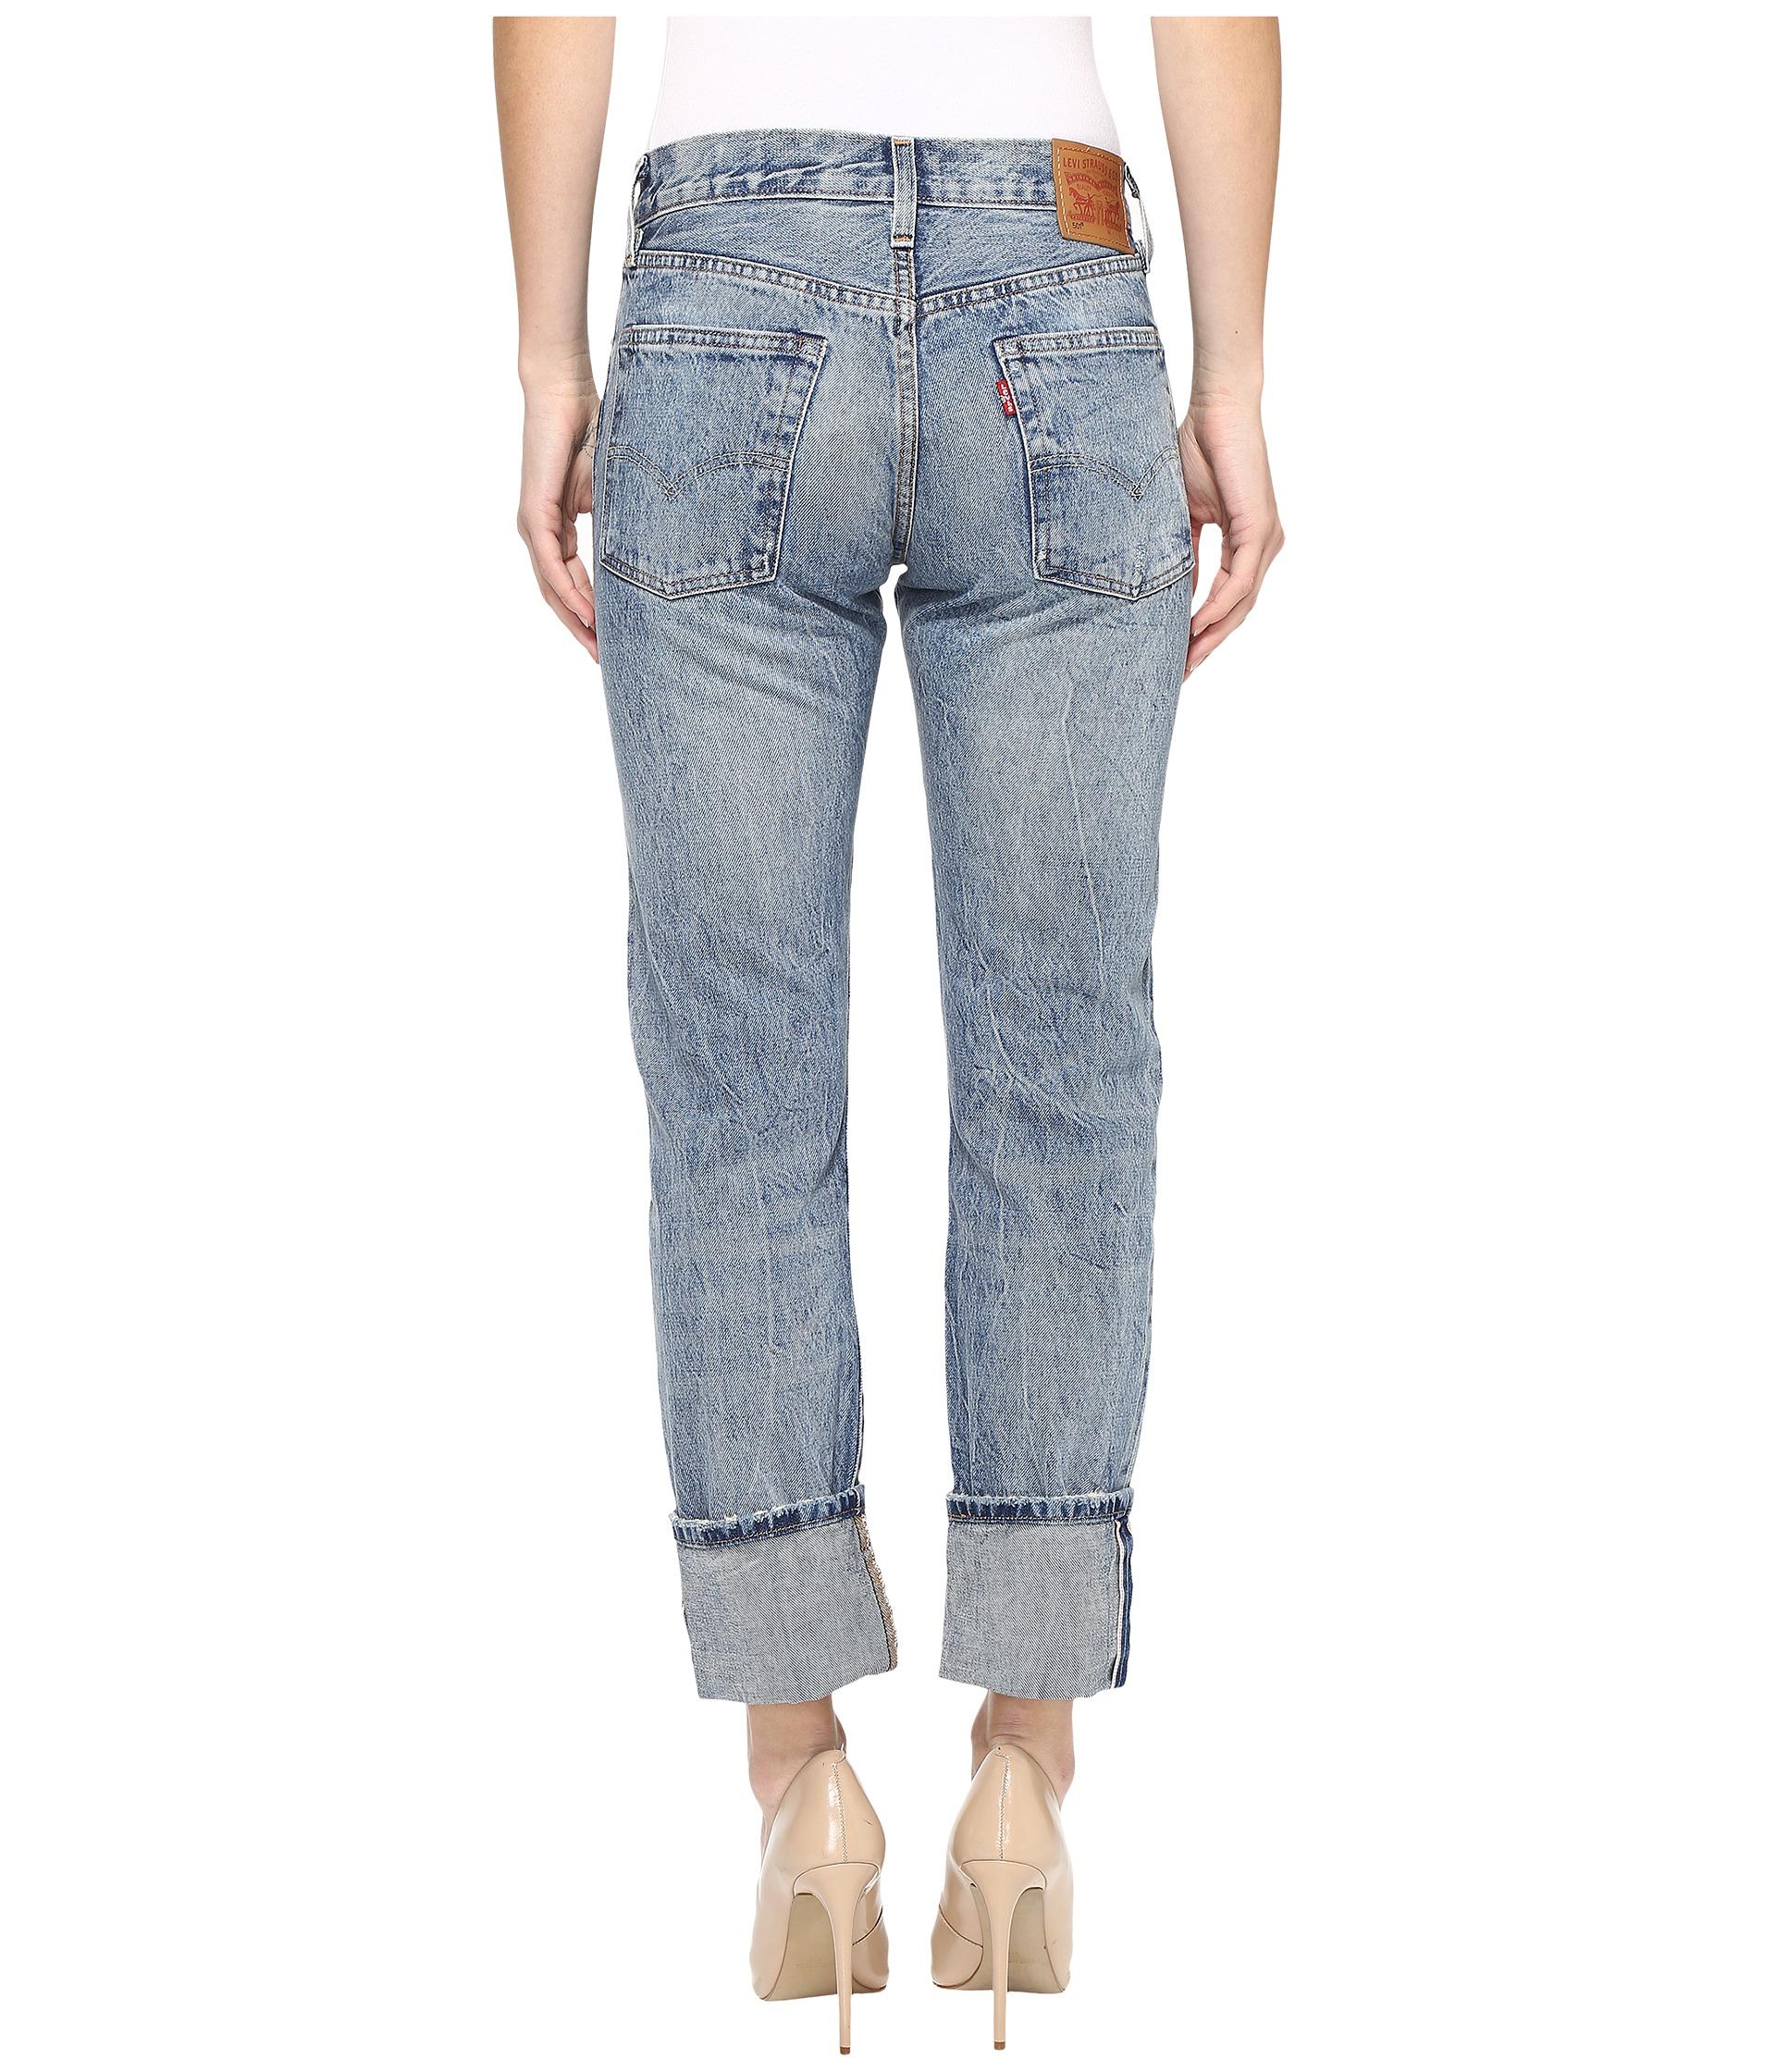 Leviu0026#39;su00ae Womens Premium 501 Jeans at Zappos.com